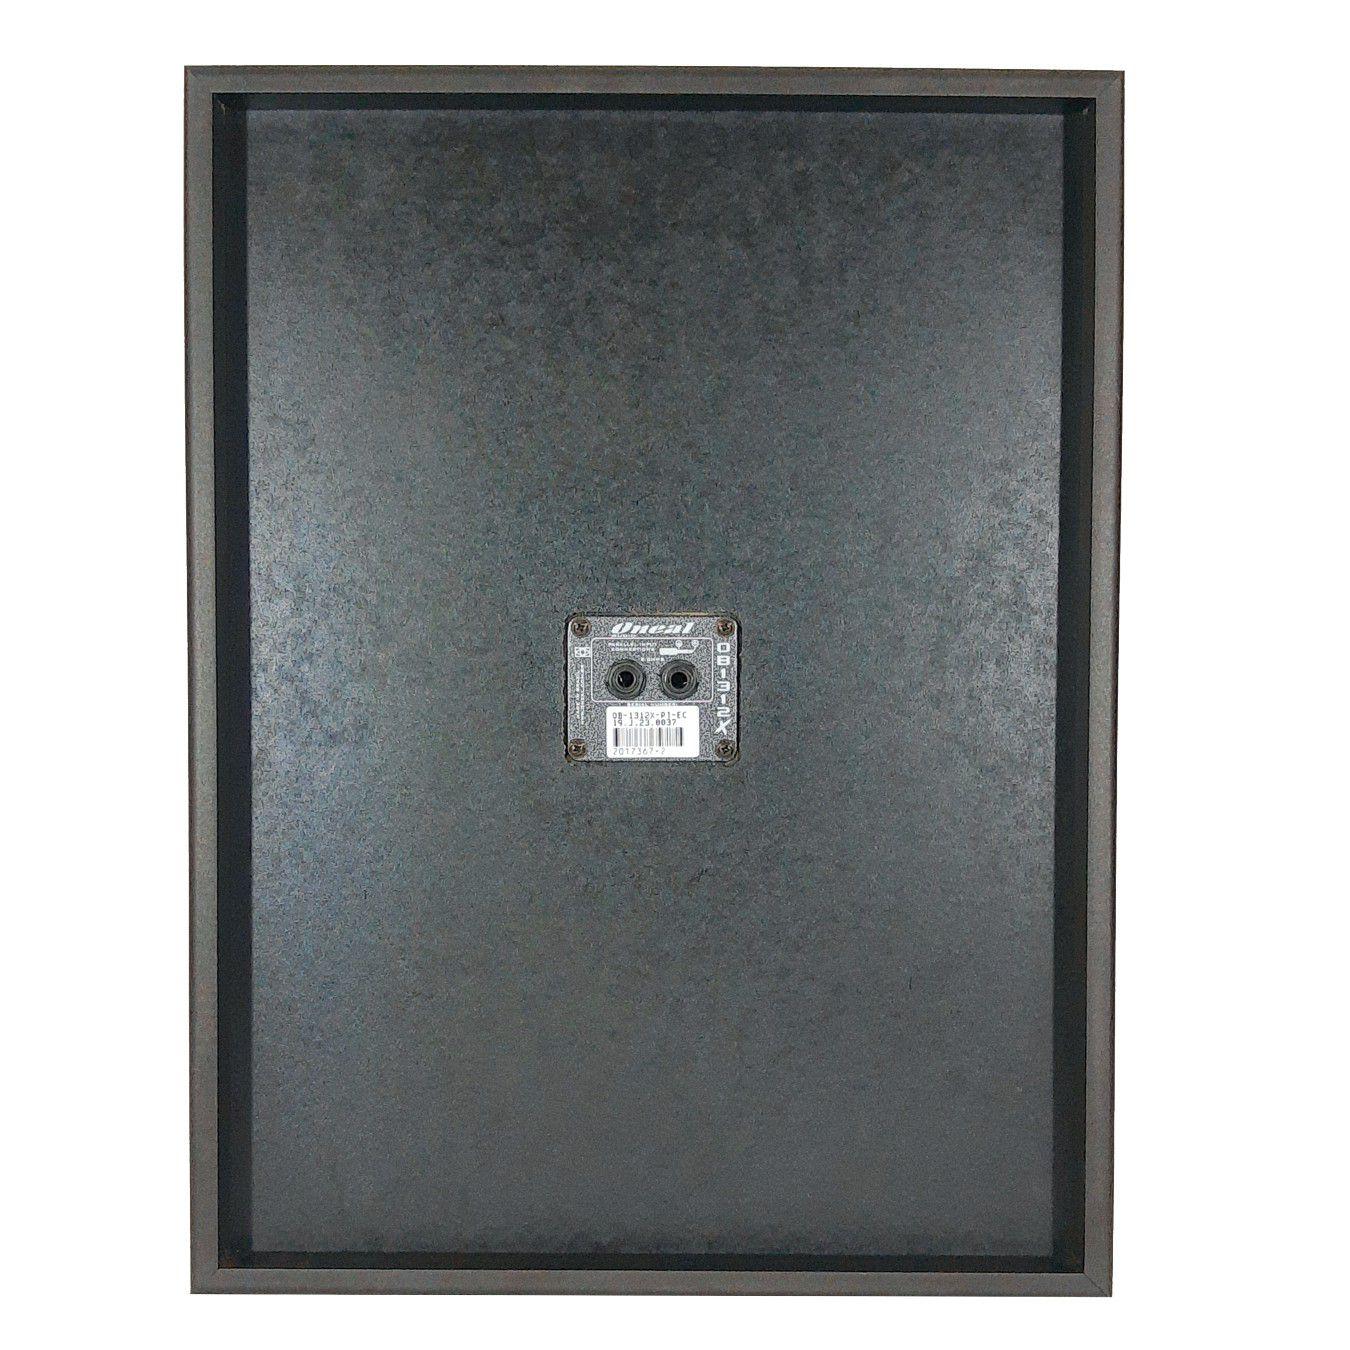 Kit Caixa de Som Ativa Passiva Oneal Opb1312x Ob1312x 200w Rms